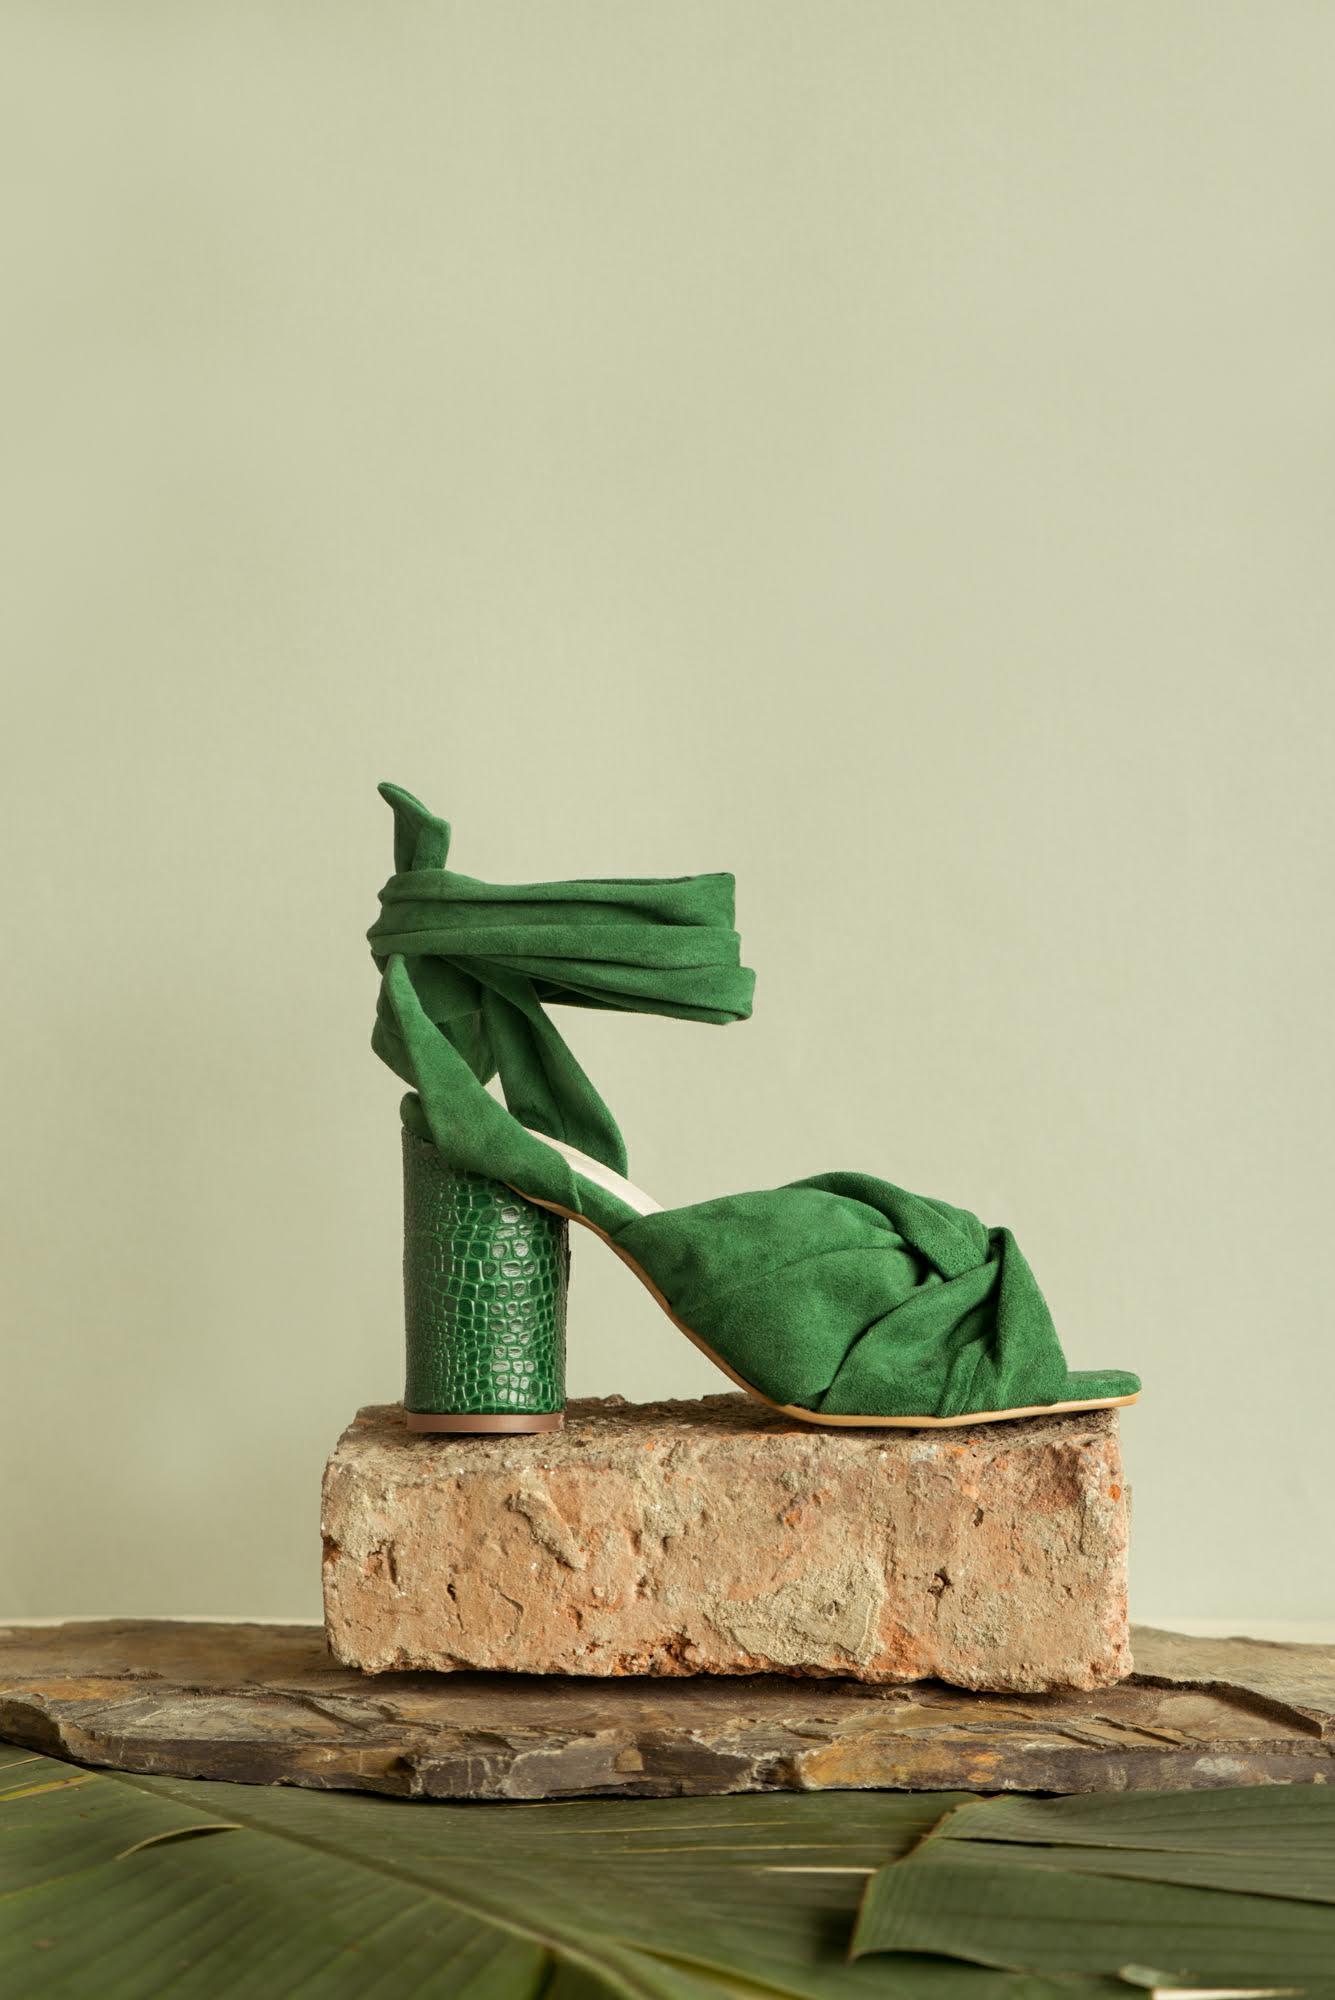 Mi Valle del Cauca heels